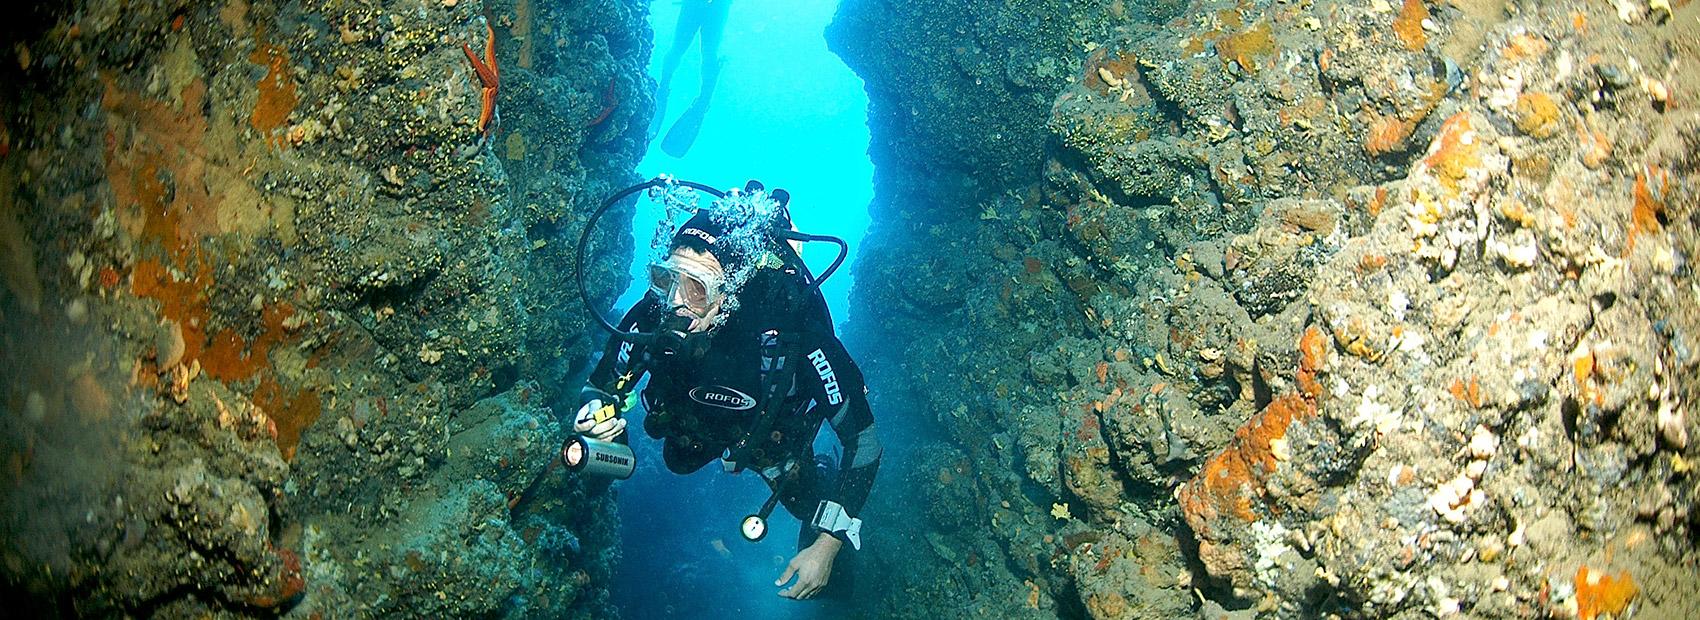 dive center spiro sub padi tauchkurse höhlentauchen auf elba diving cave